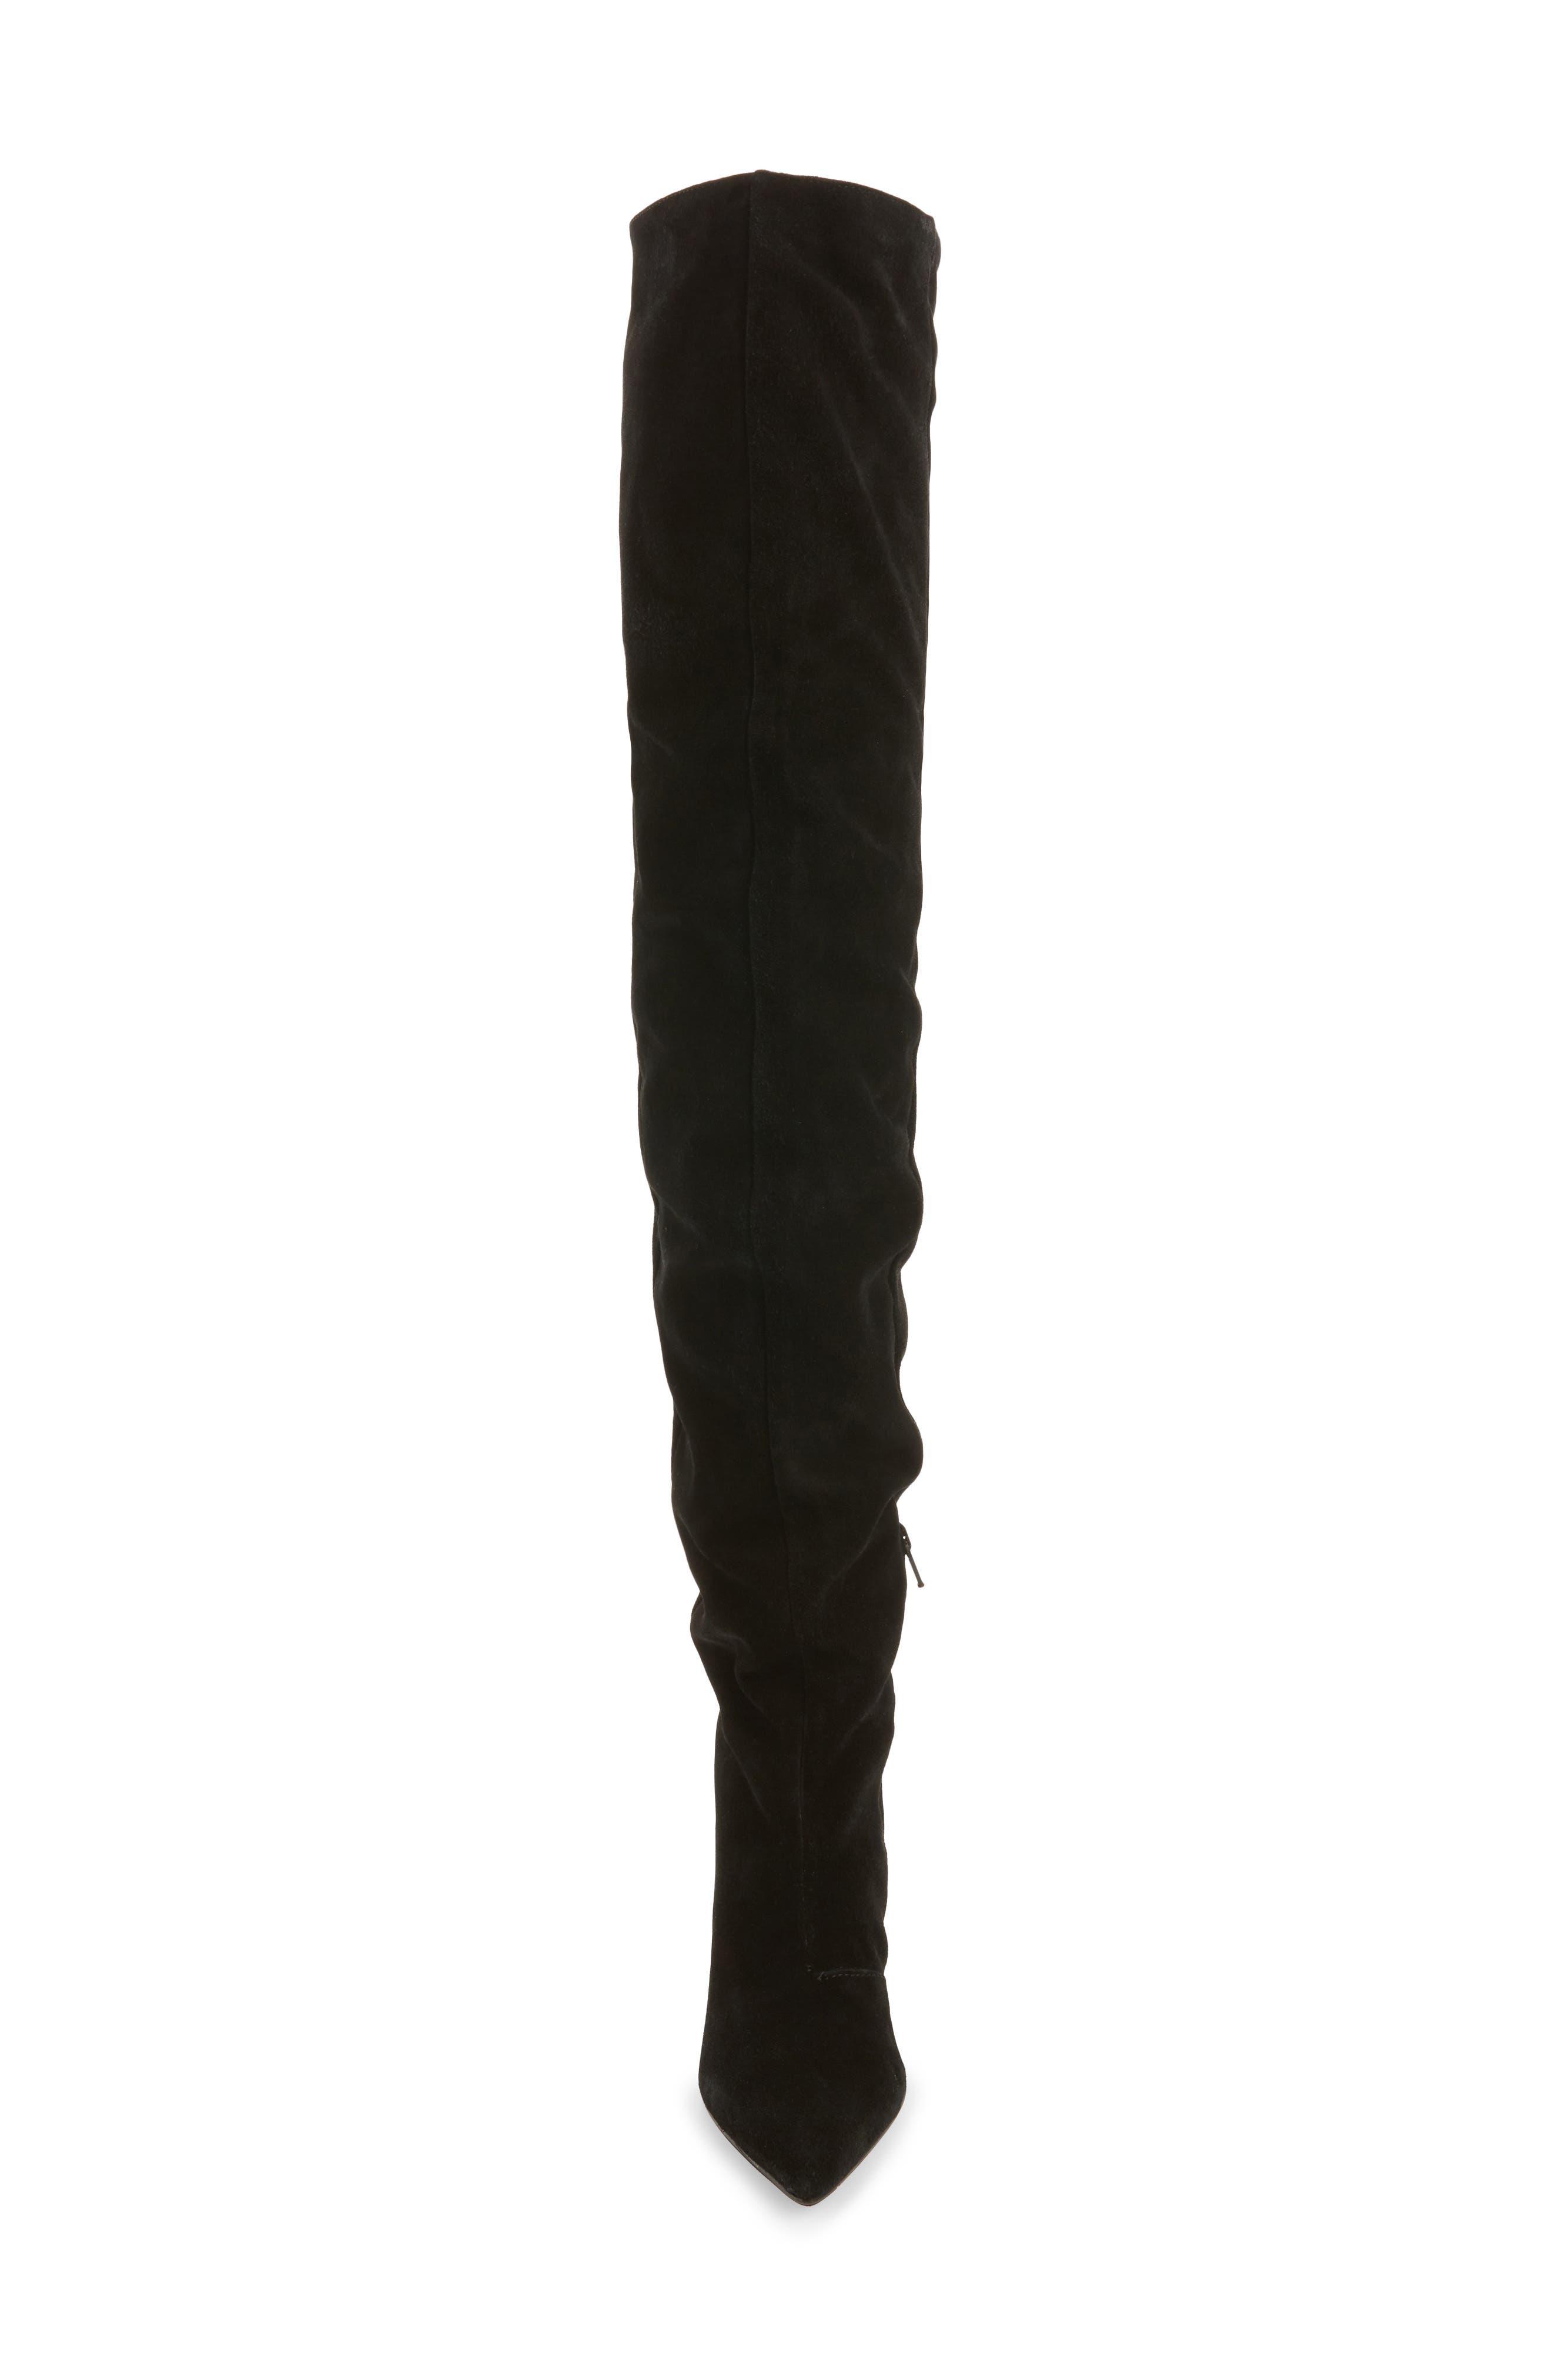 Alternate Image 4  - Topshop Boxer Thigh High Boots (Women)